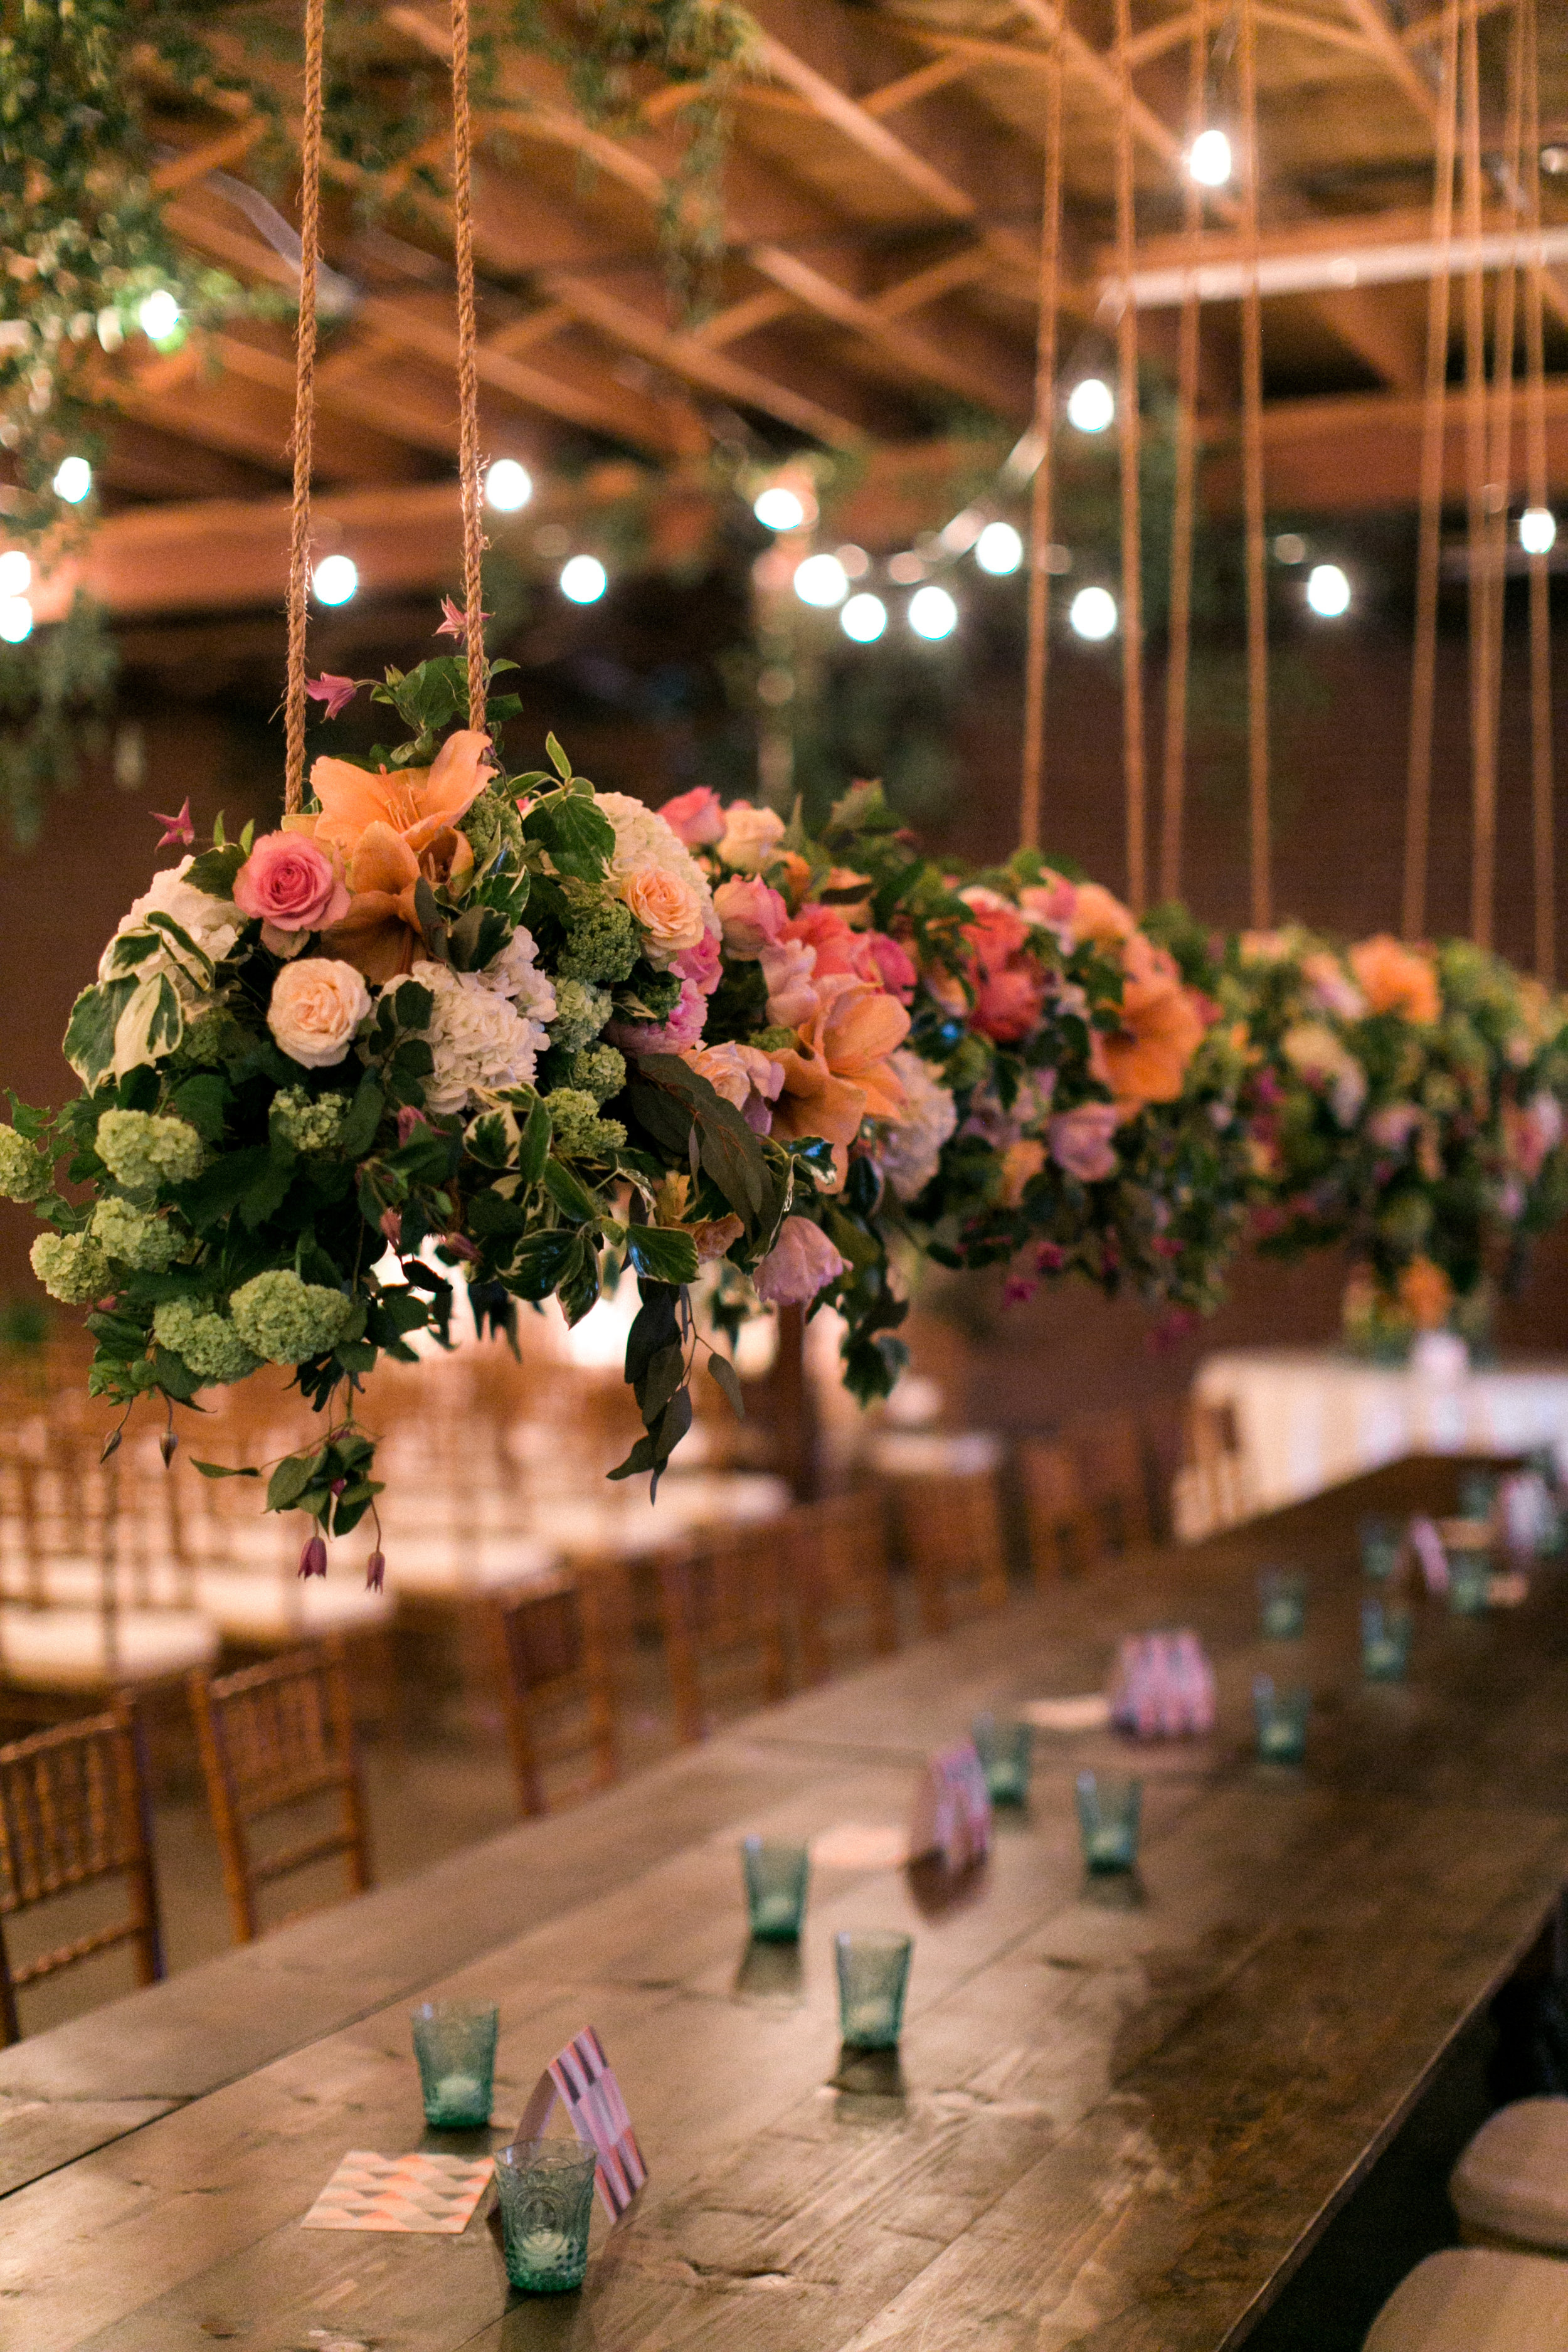 Parie Designs suspended florals